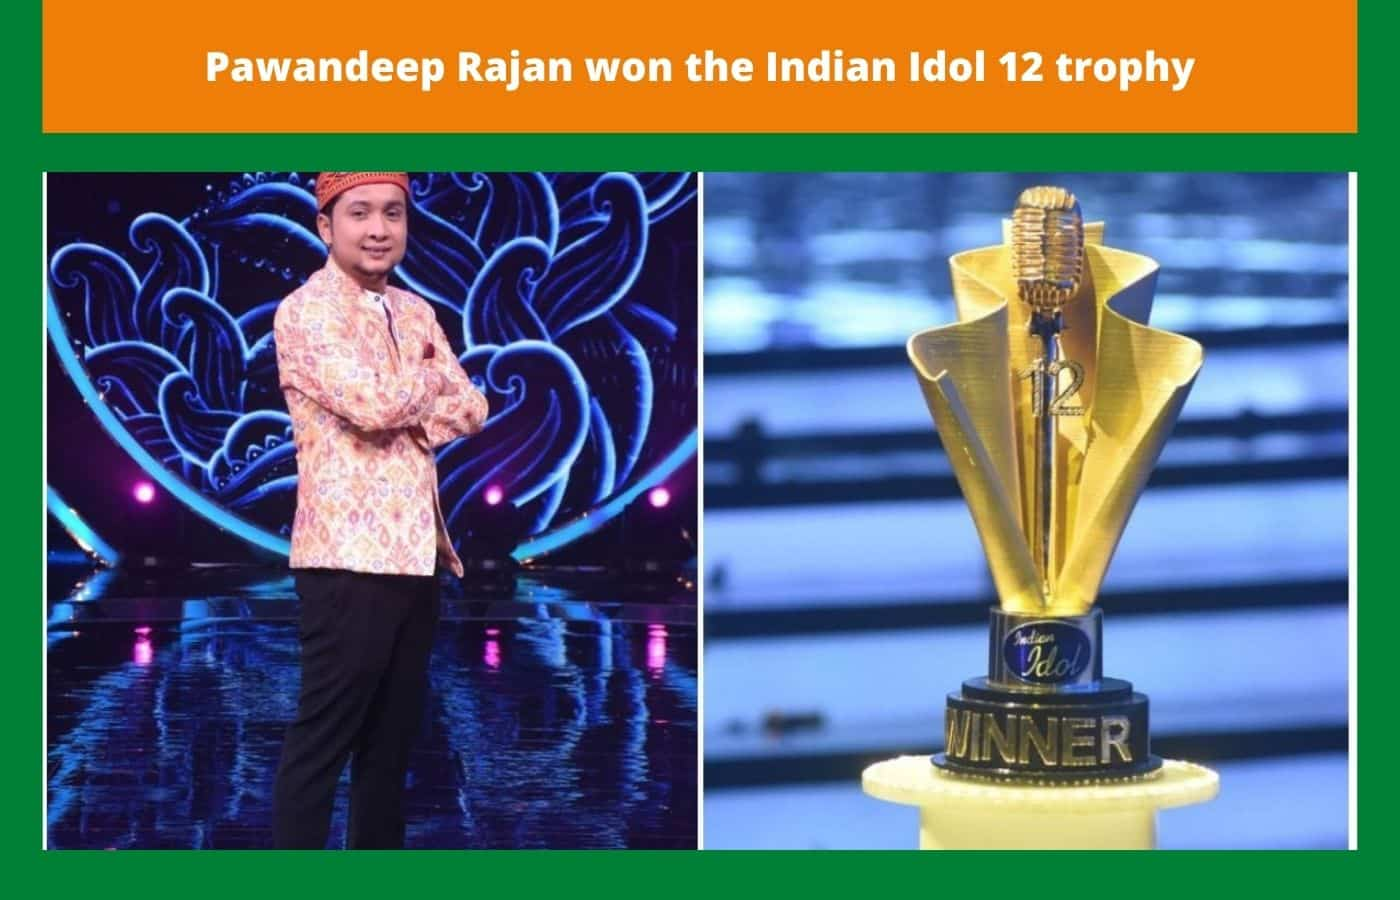 Pawandeep Rajan won the Indian Idol 12 trophy